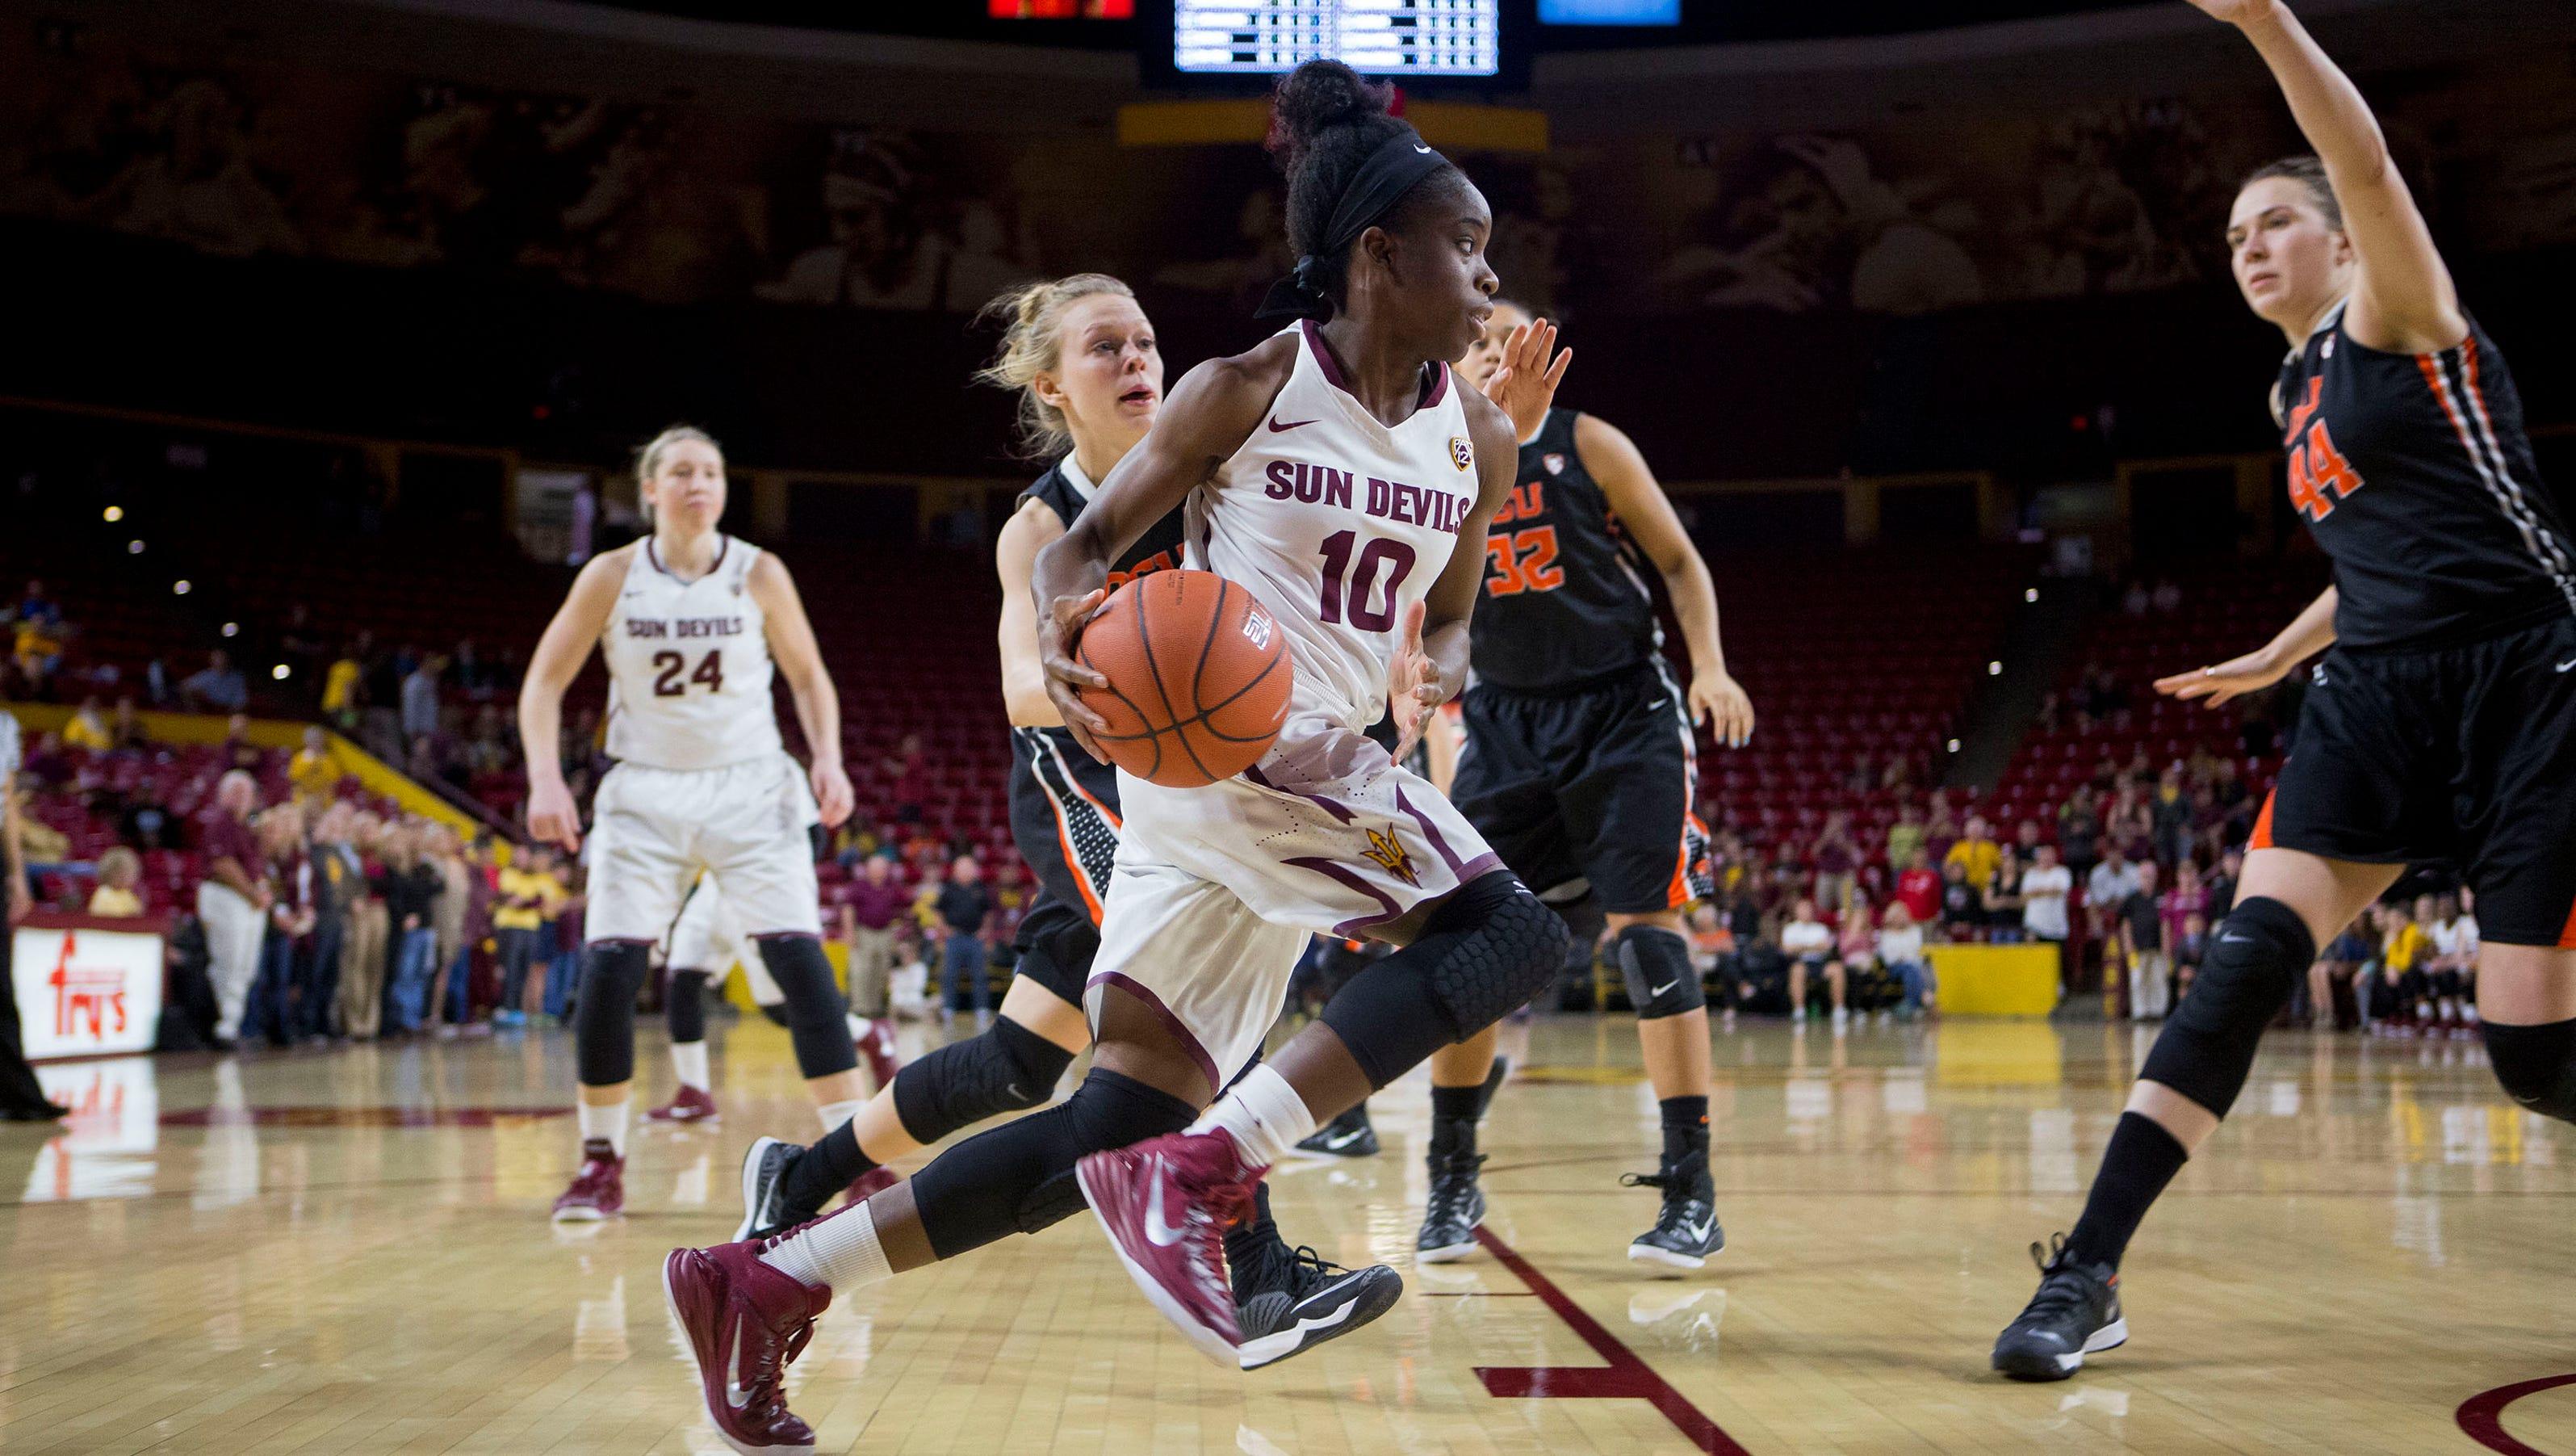 Two ASU women's basketball players earn Pac-12 awards